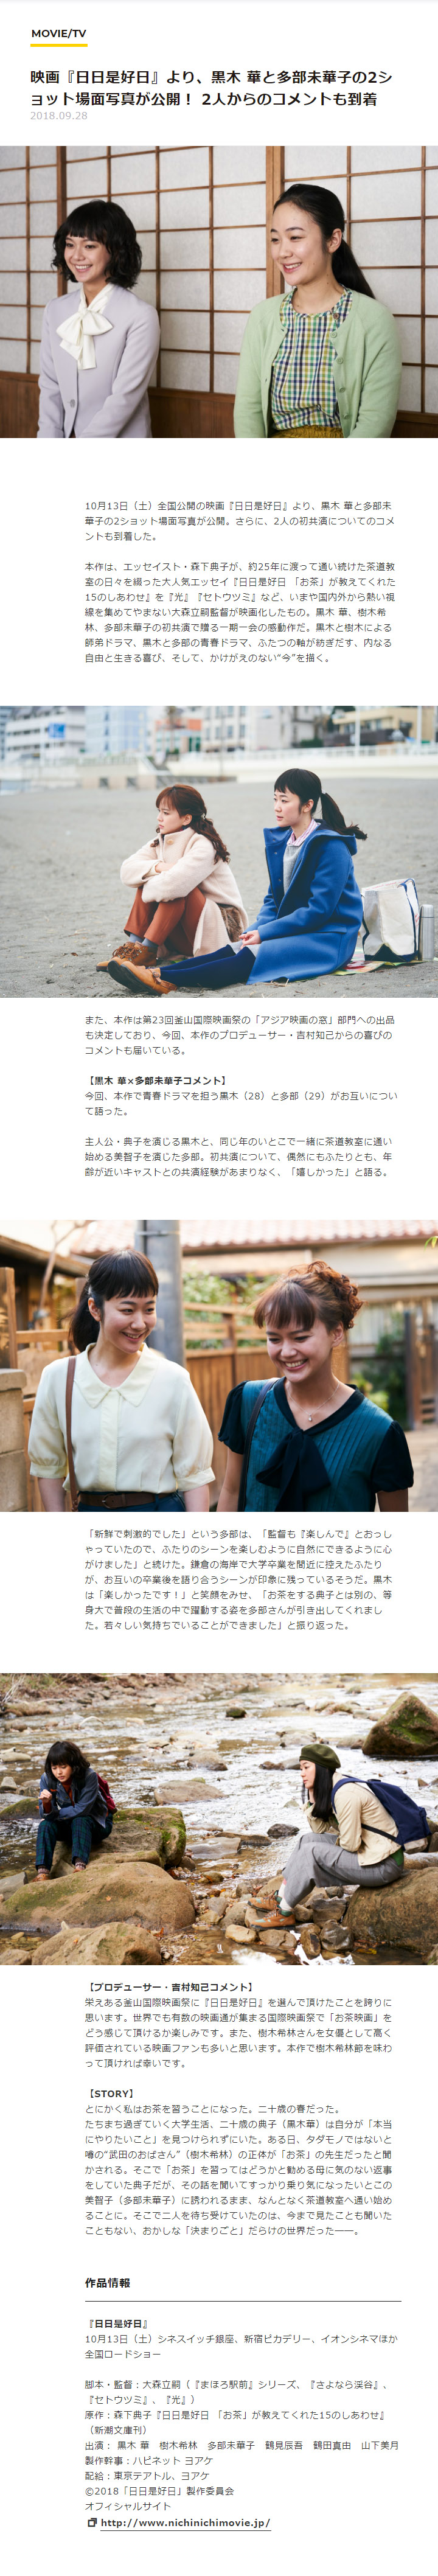 entertainmentstation2018_09_28-000.jpg